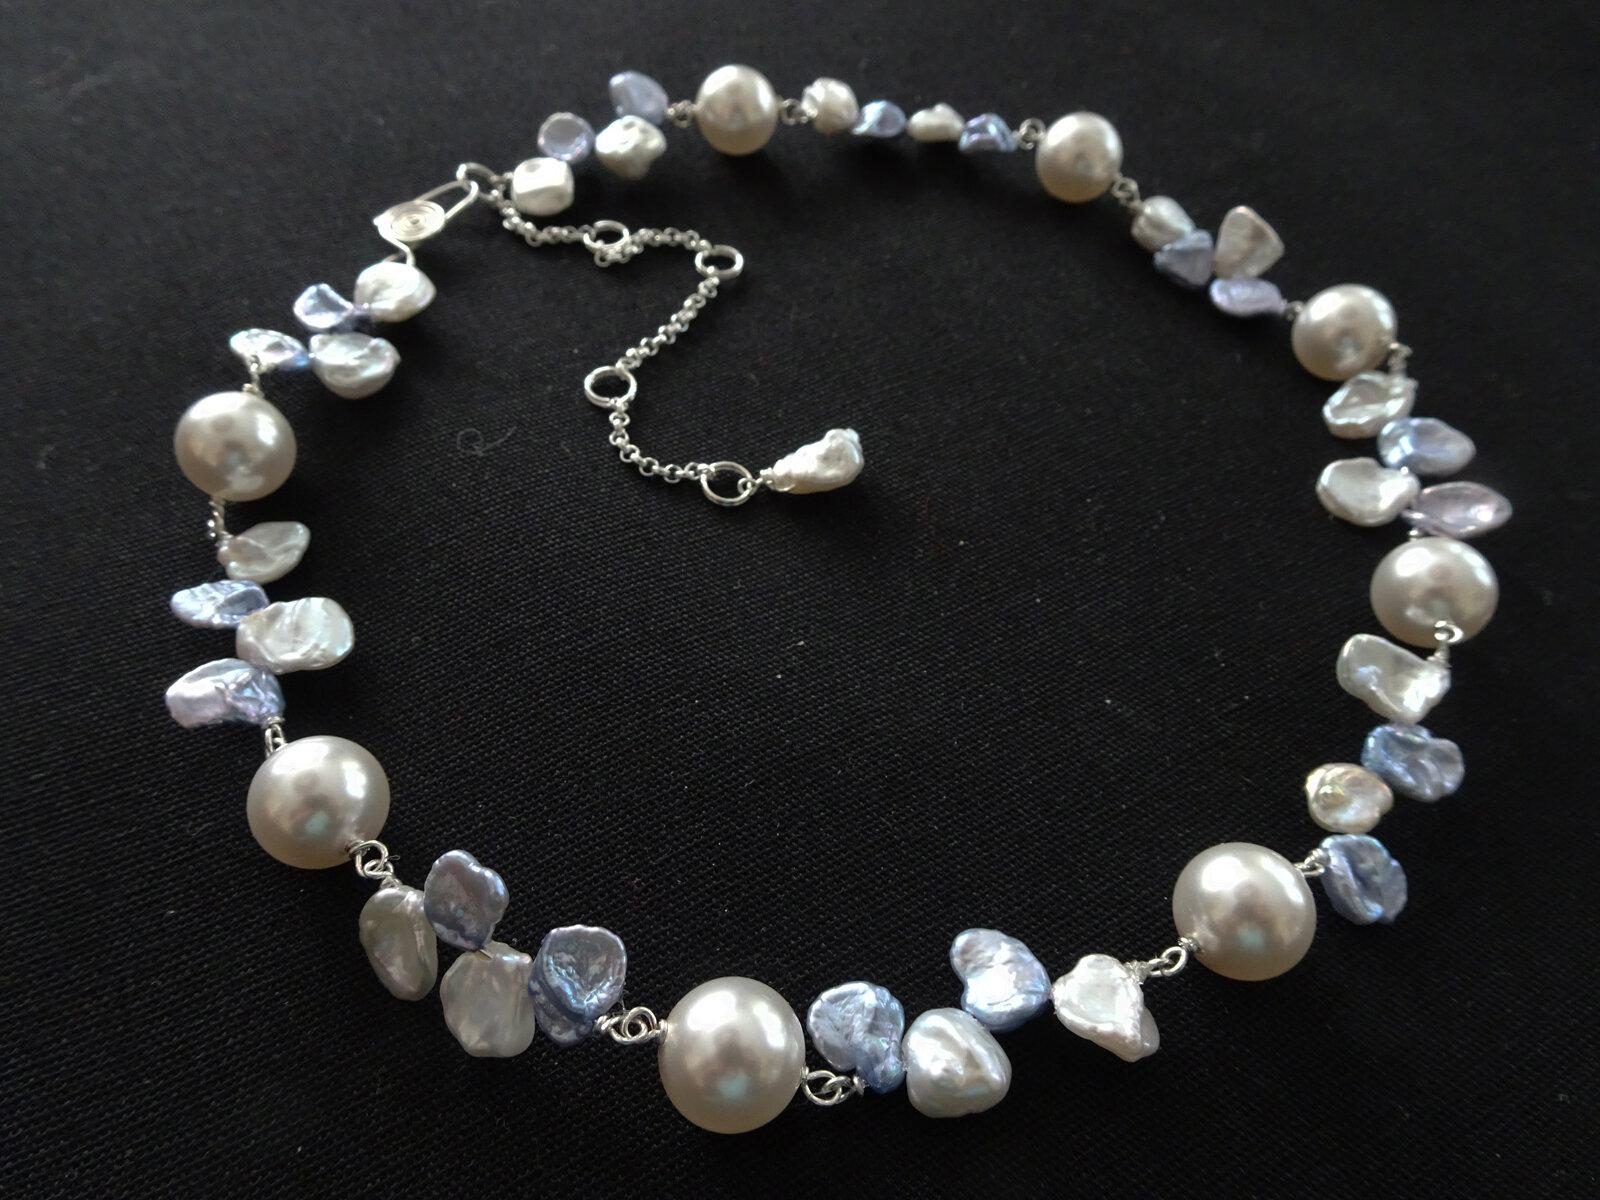 Sea Shell 2019  Necklace & Earrings  Keishi Pearl, Swarovski Pearl, Sterling Silver